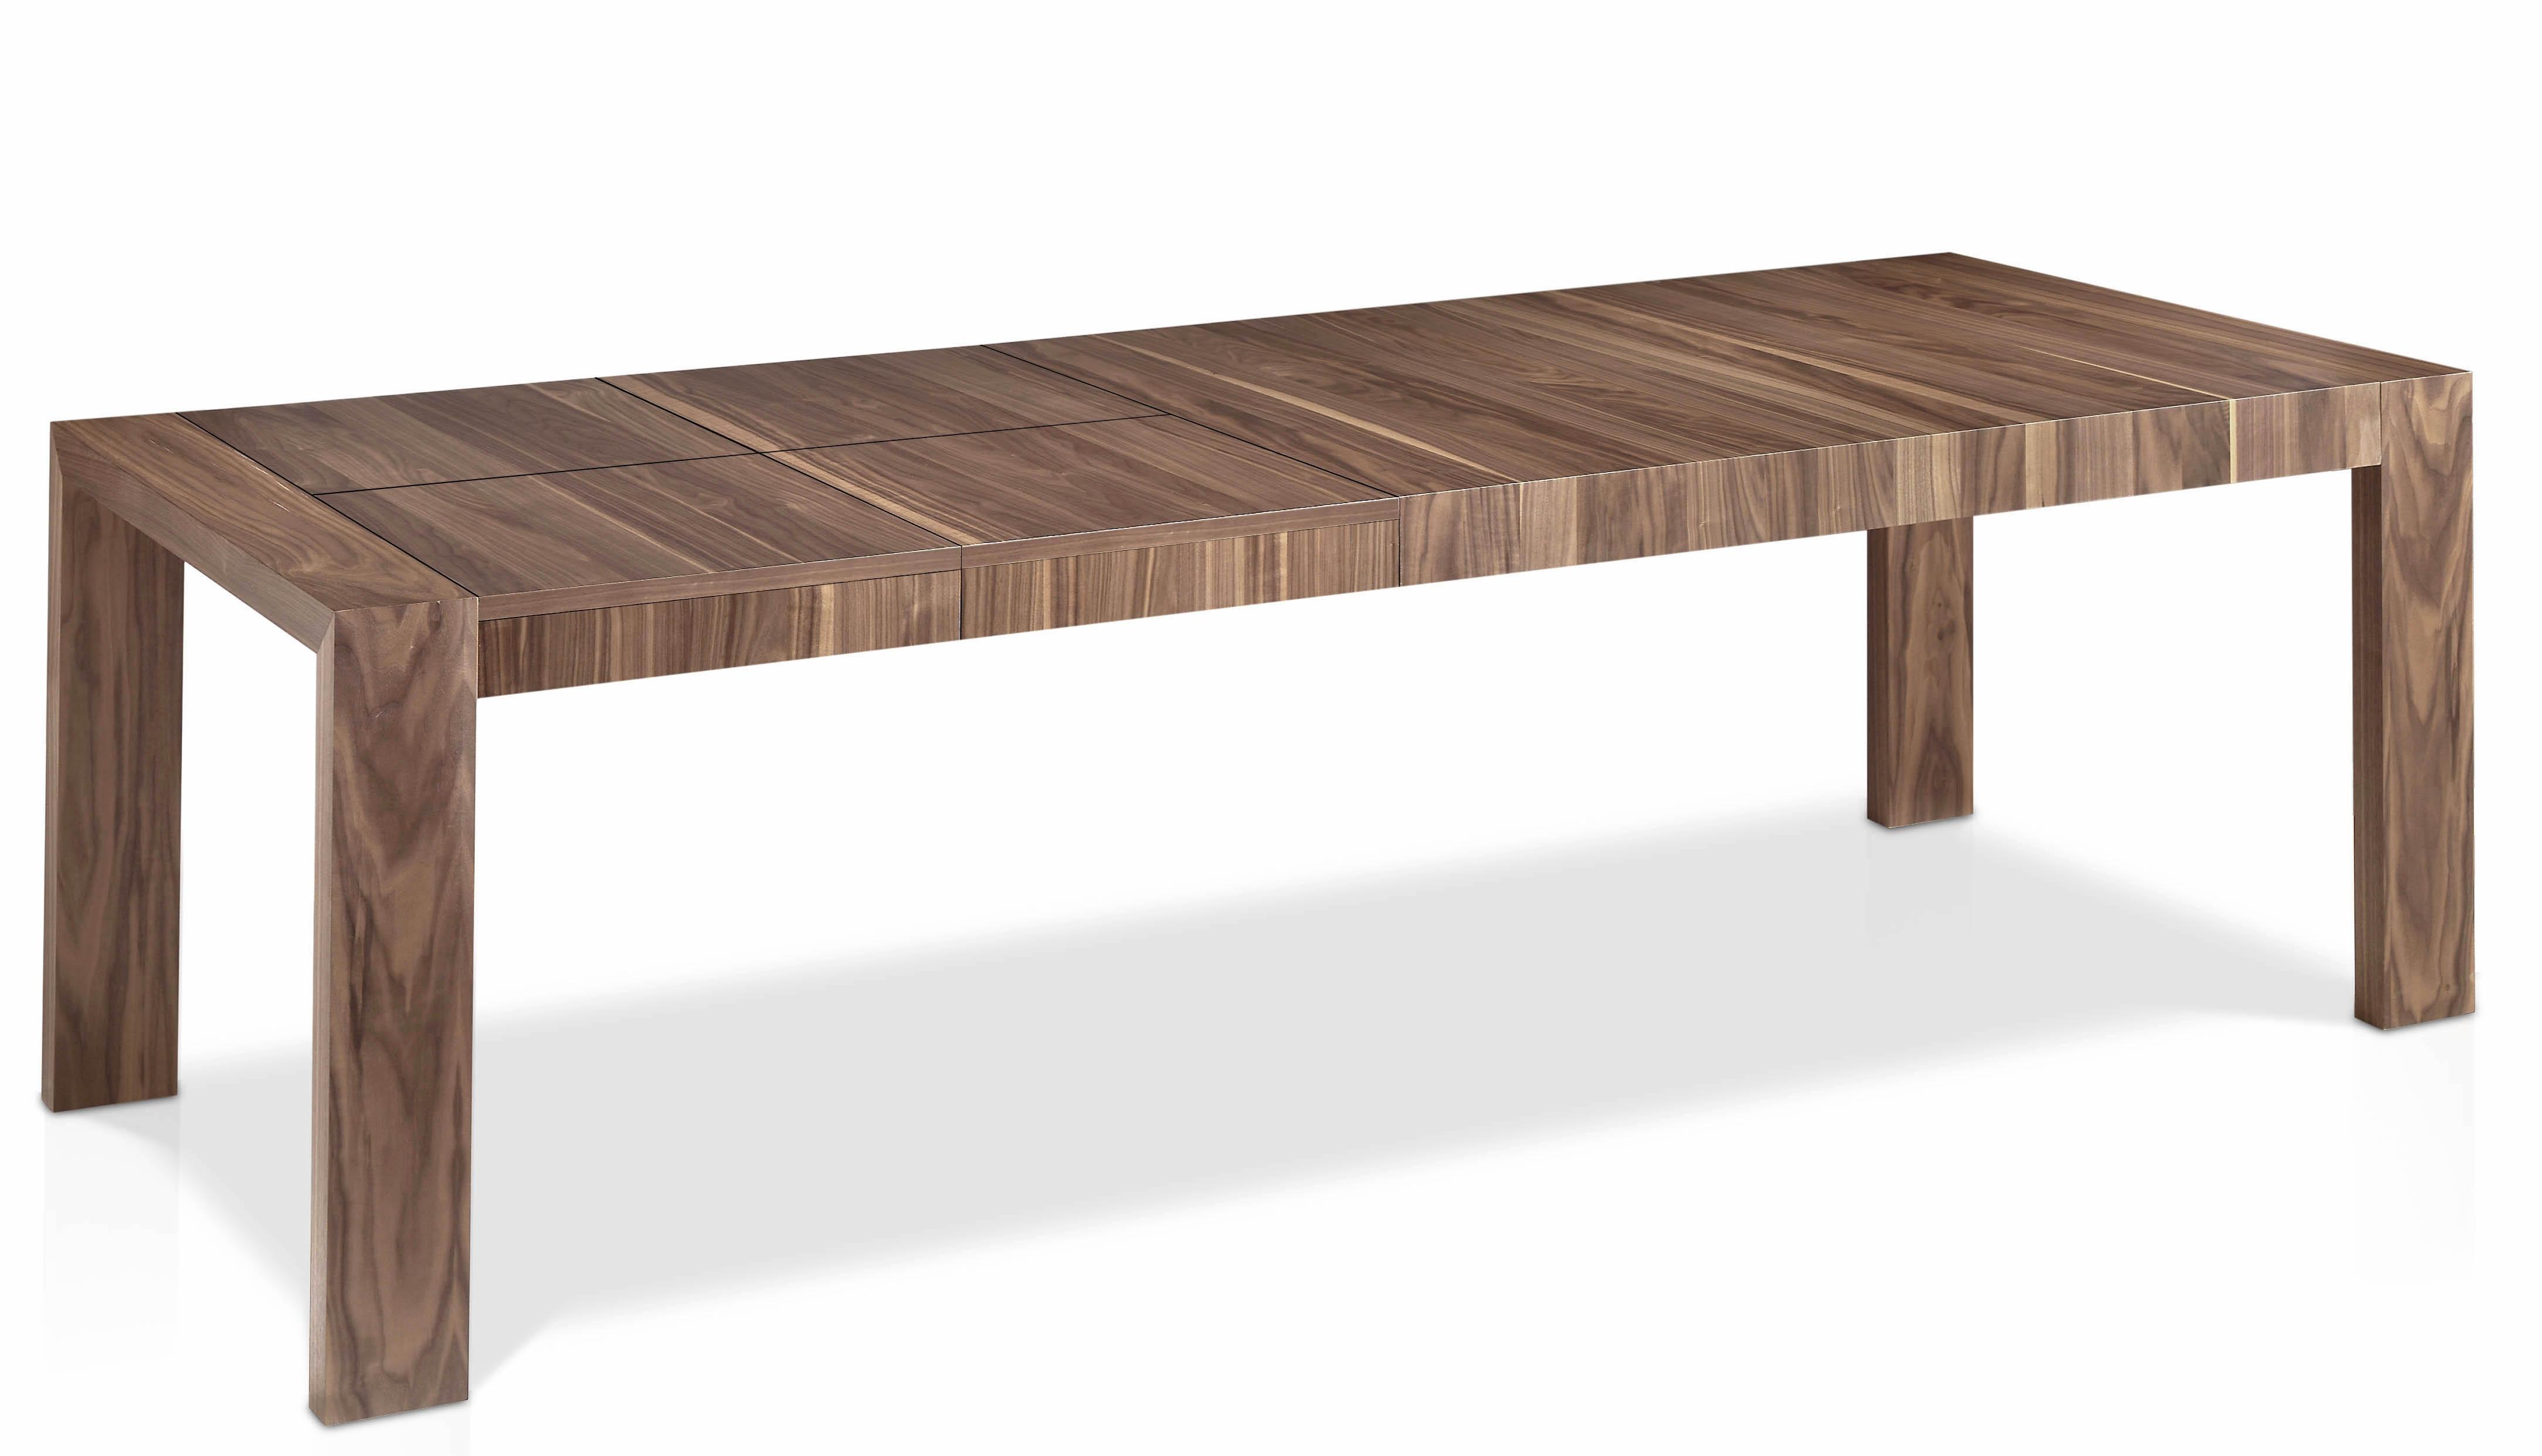 table extensible bois plaqu noyer 160 260 cm koza. Black Bedroom Furniture Sets. Home Design Ideas